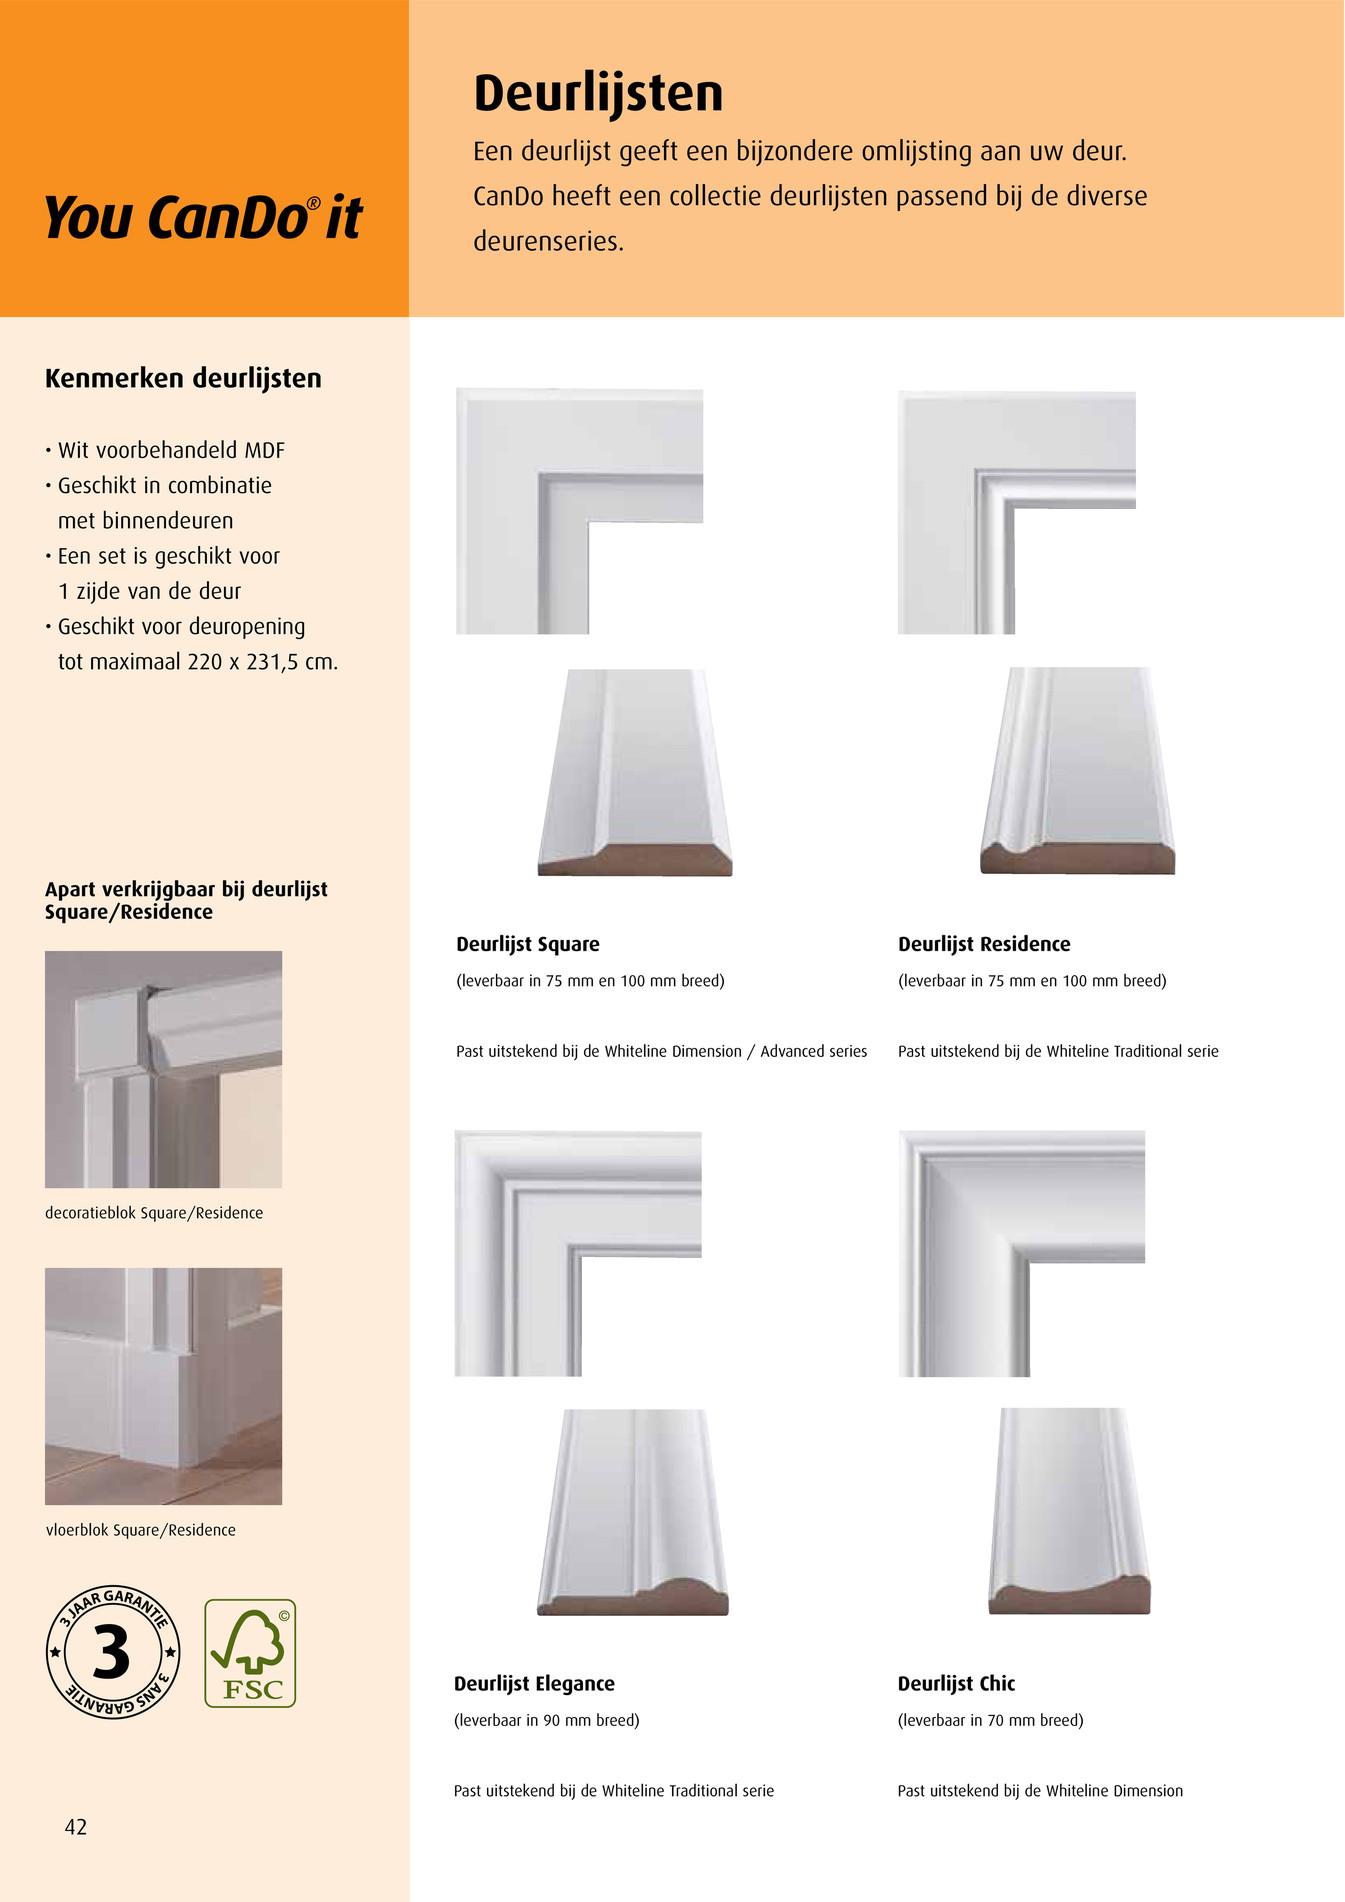 Multimate - CanDo deuren brochure - Pagina 42-43 Multimate